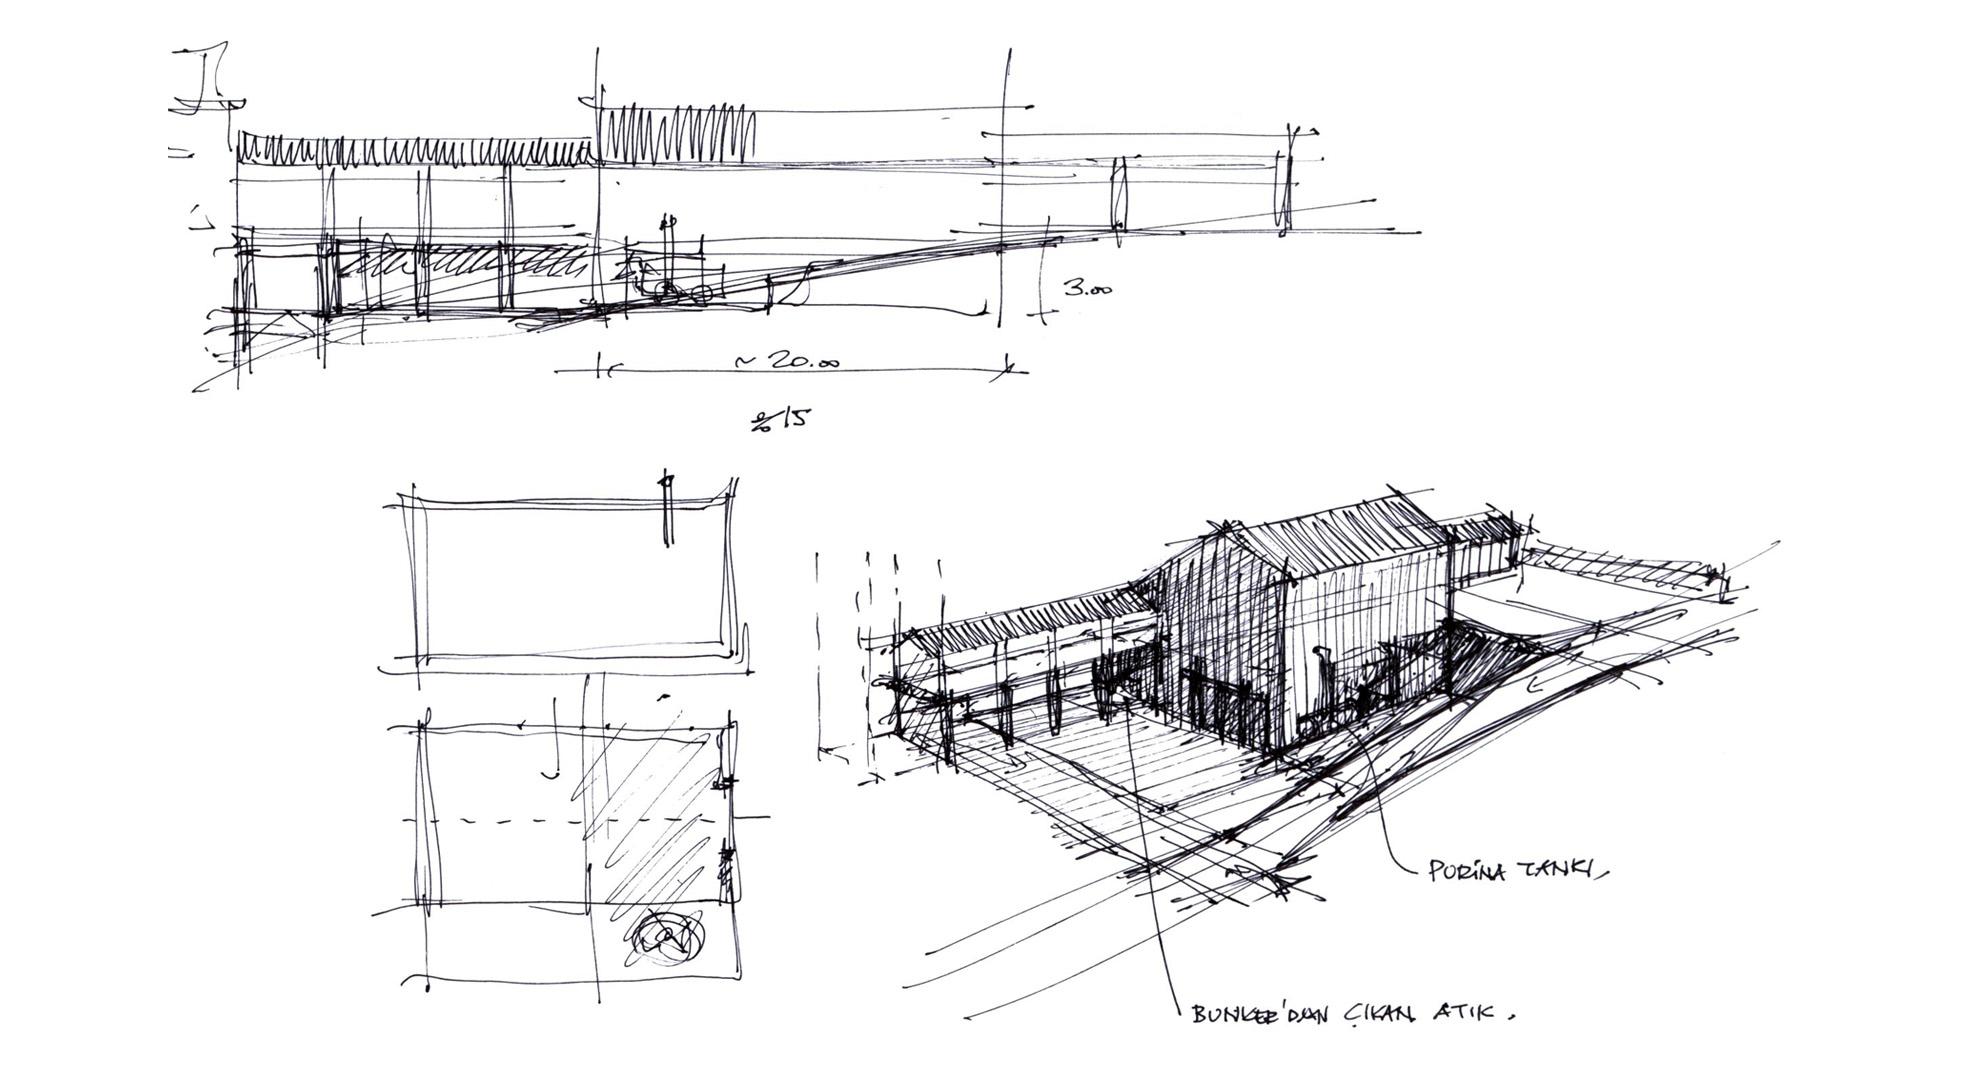 Conceptual sketches by Han Tümertekin.